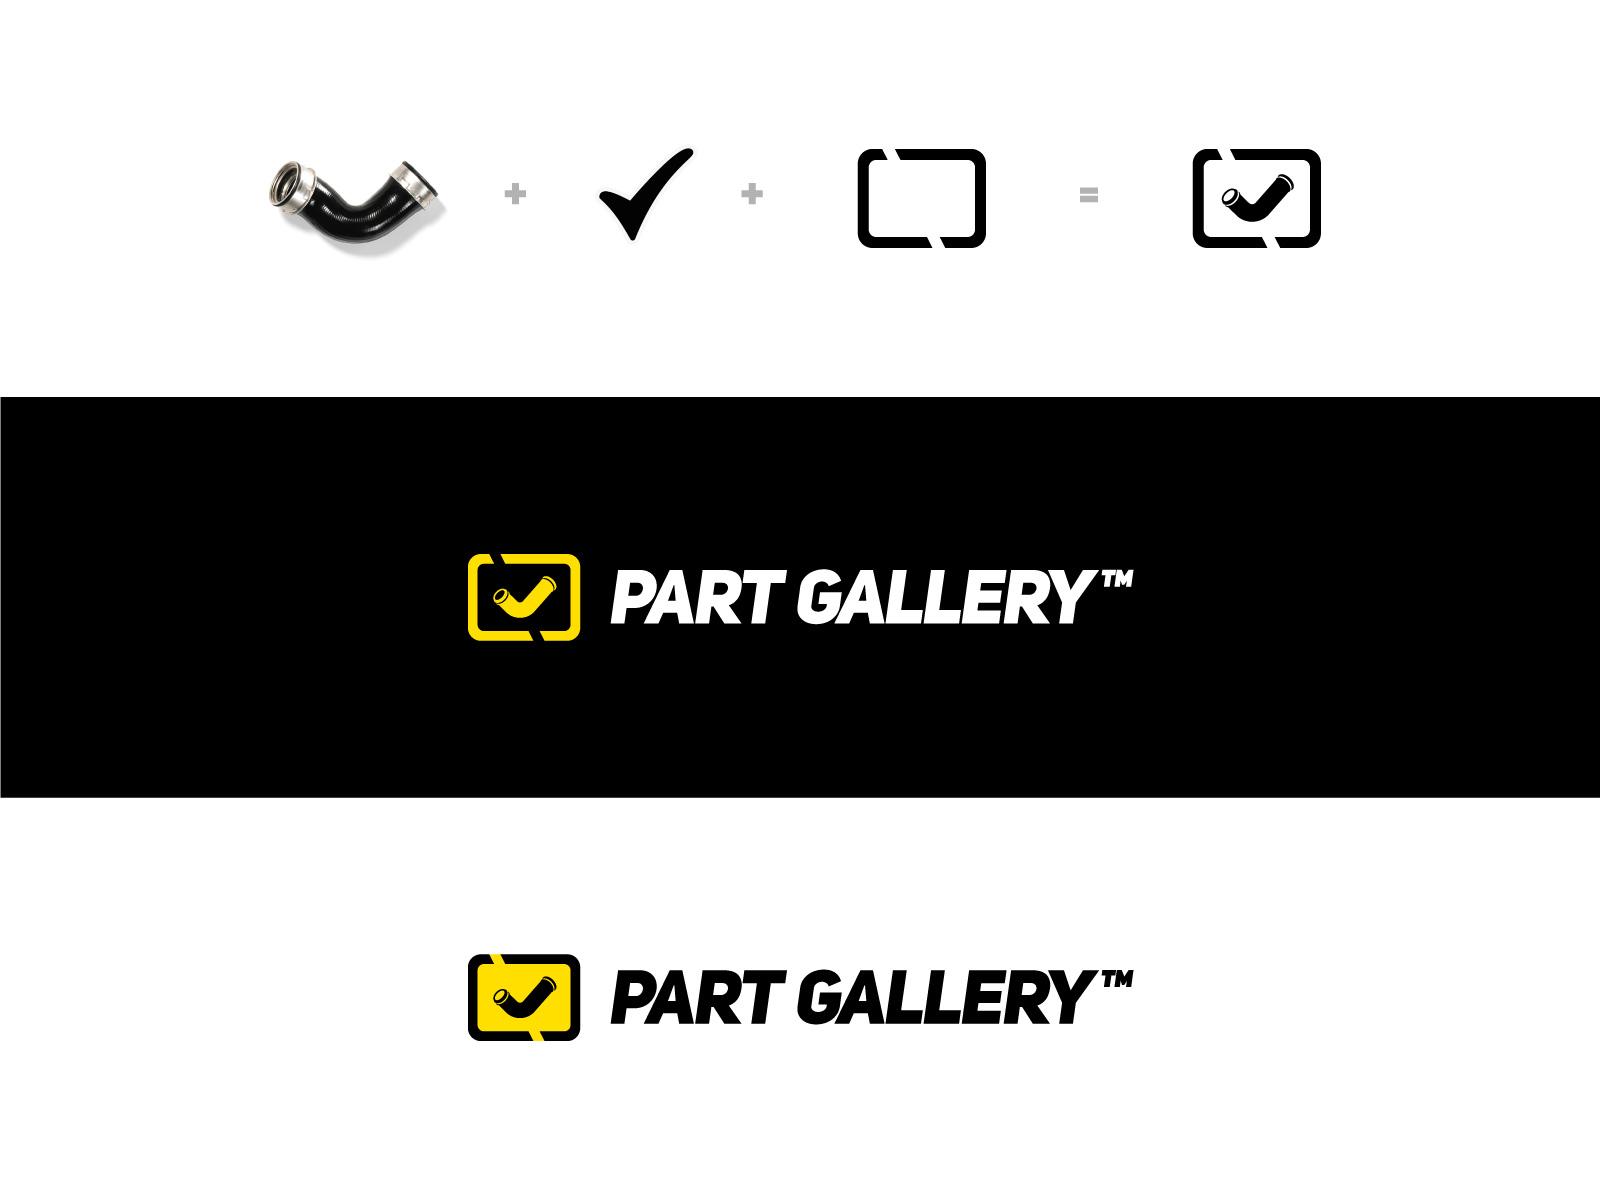 PartGallery_Logo_Olusum